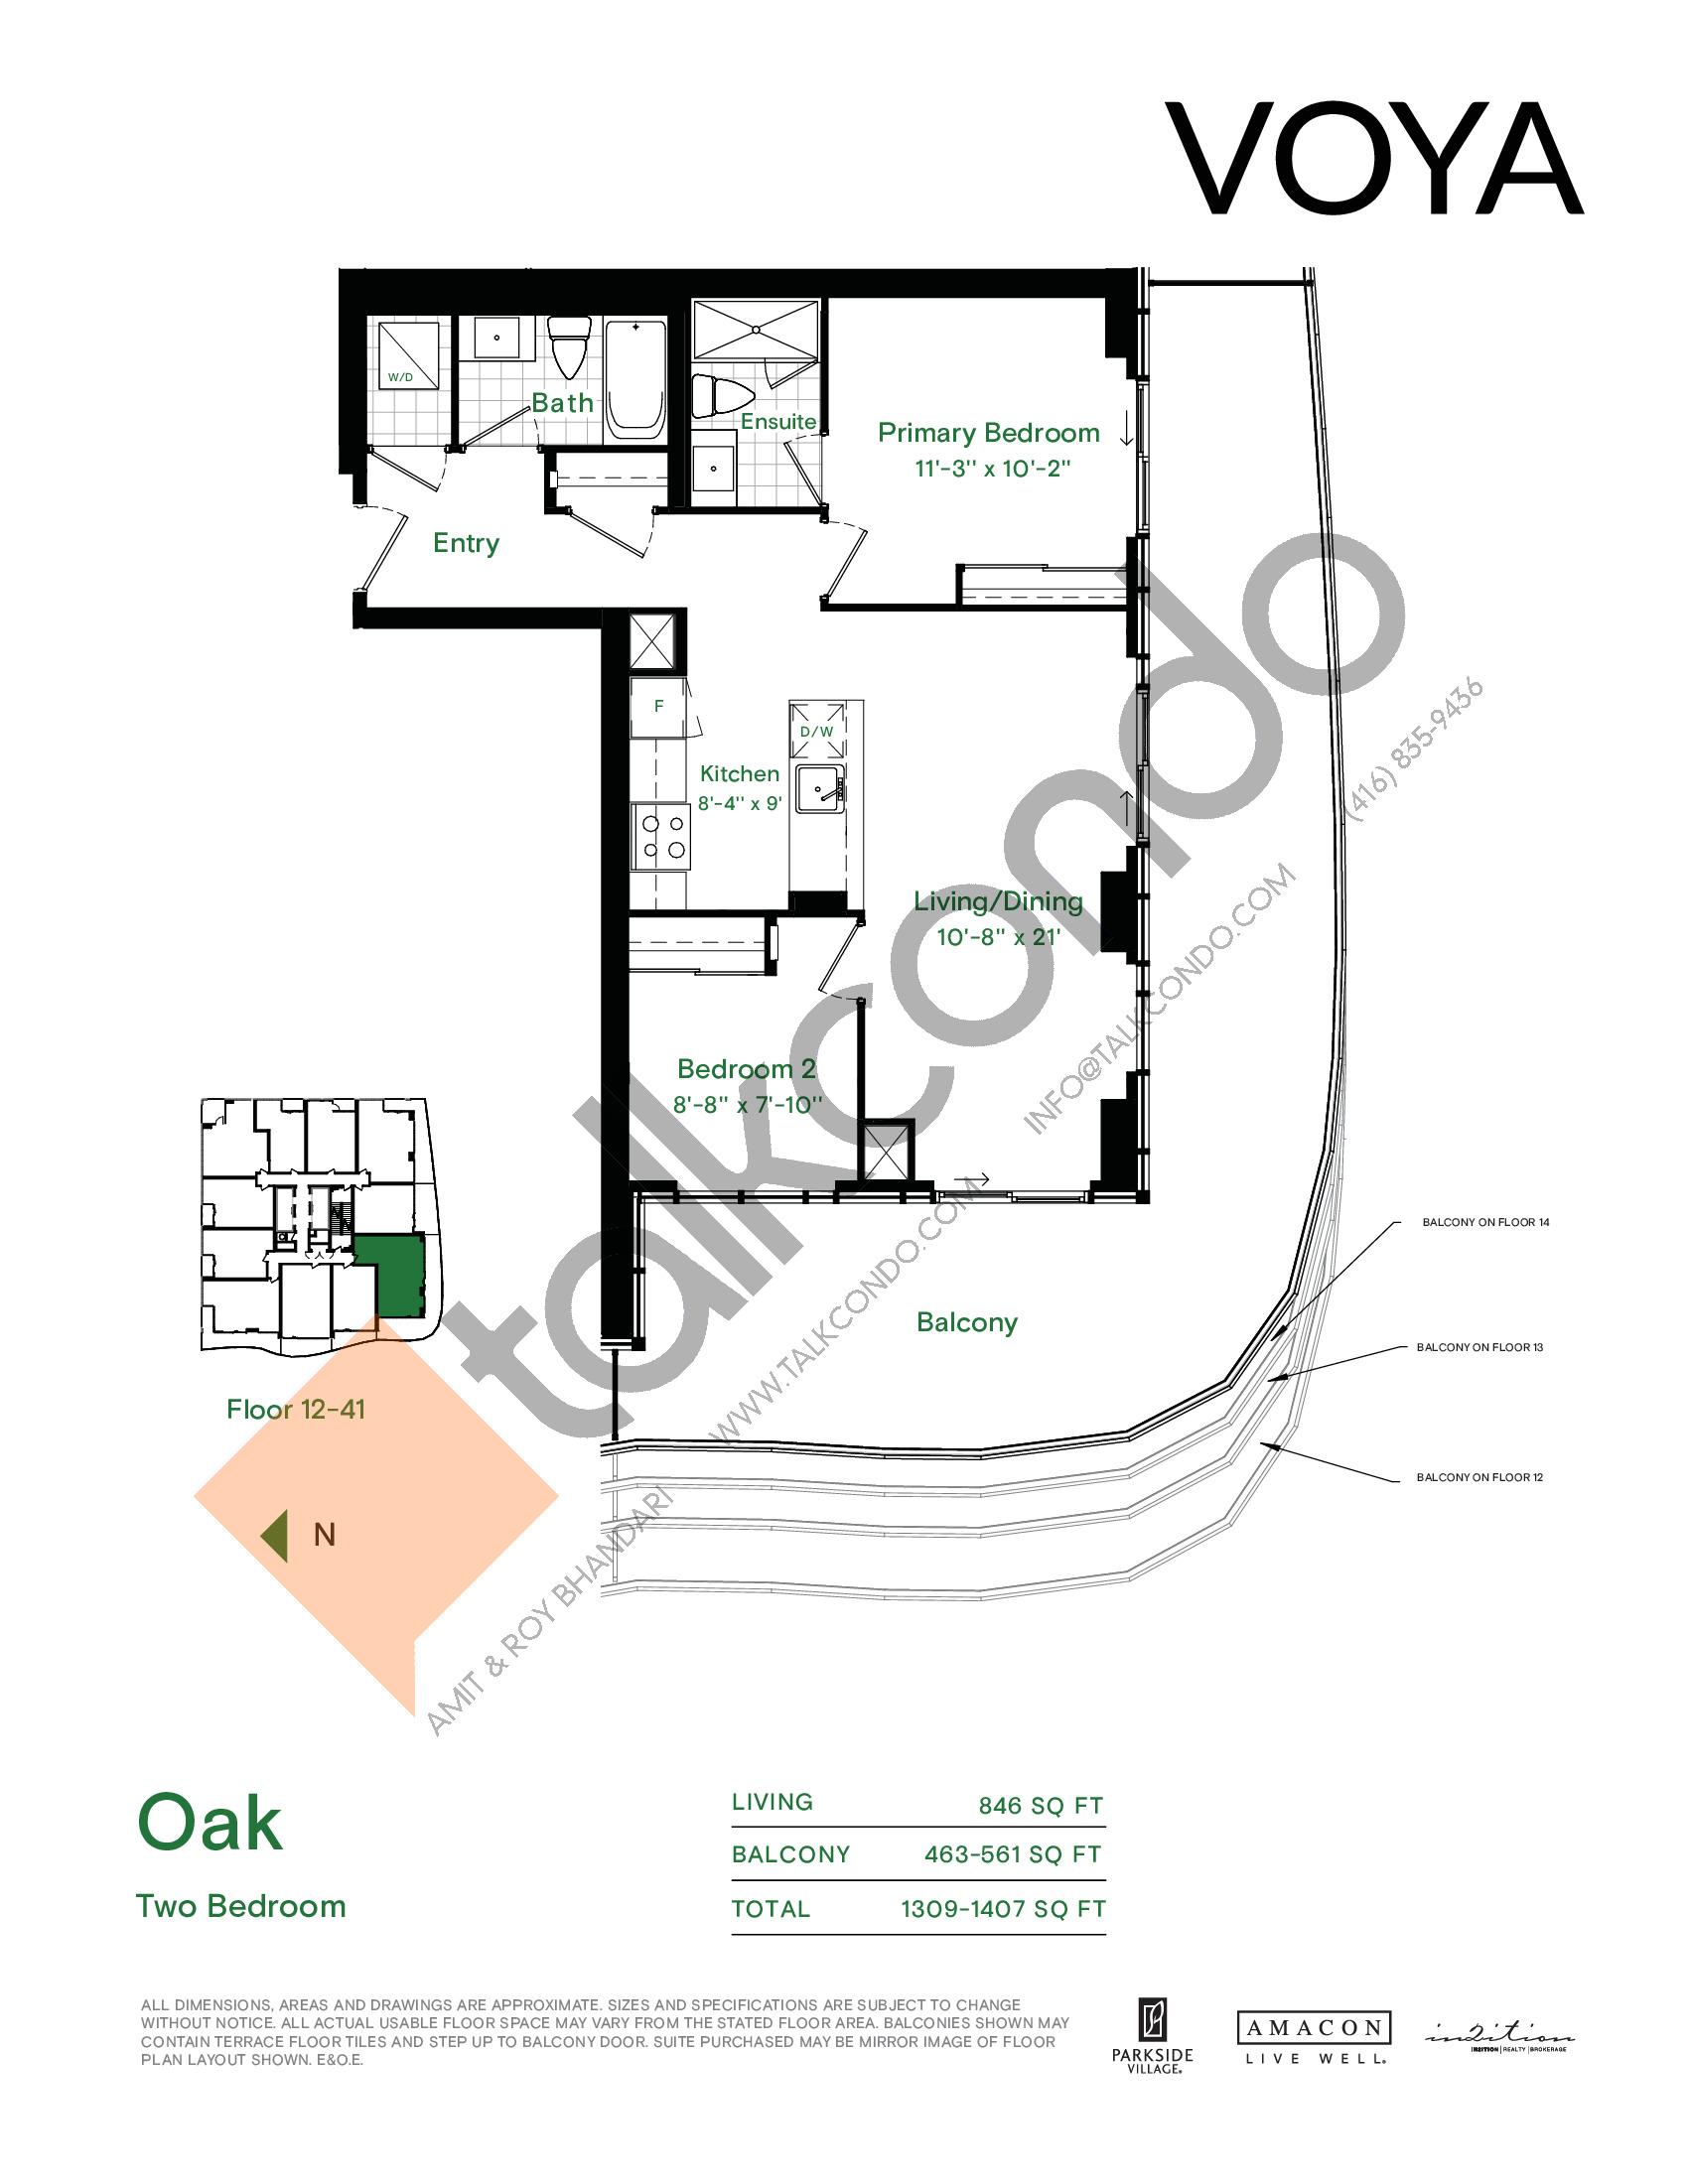 Oak Floor Plan at Voya at Parkside Village Condos - 846 sq.ft